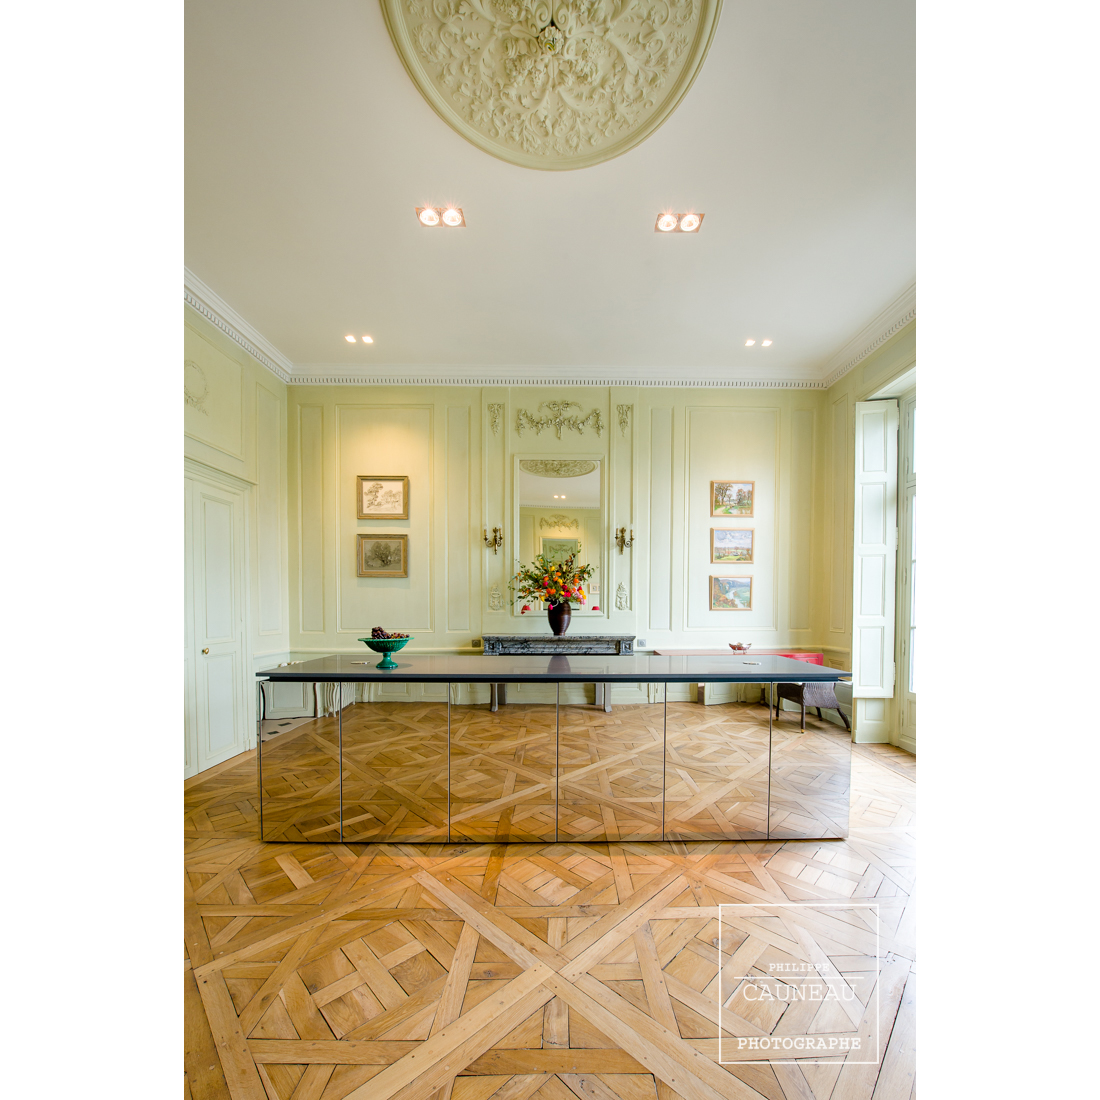 COdesign-Appartement-XVIII